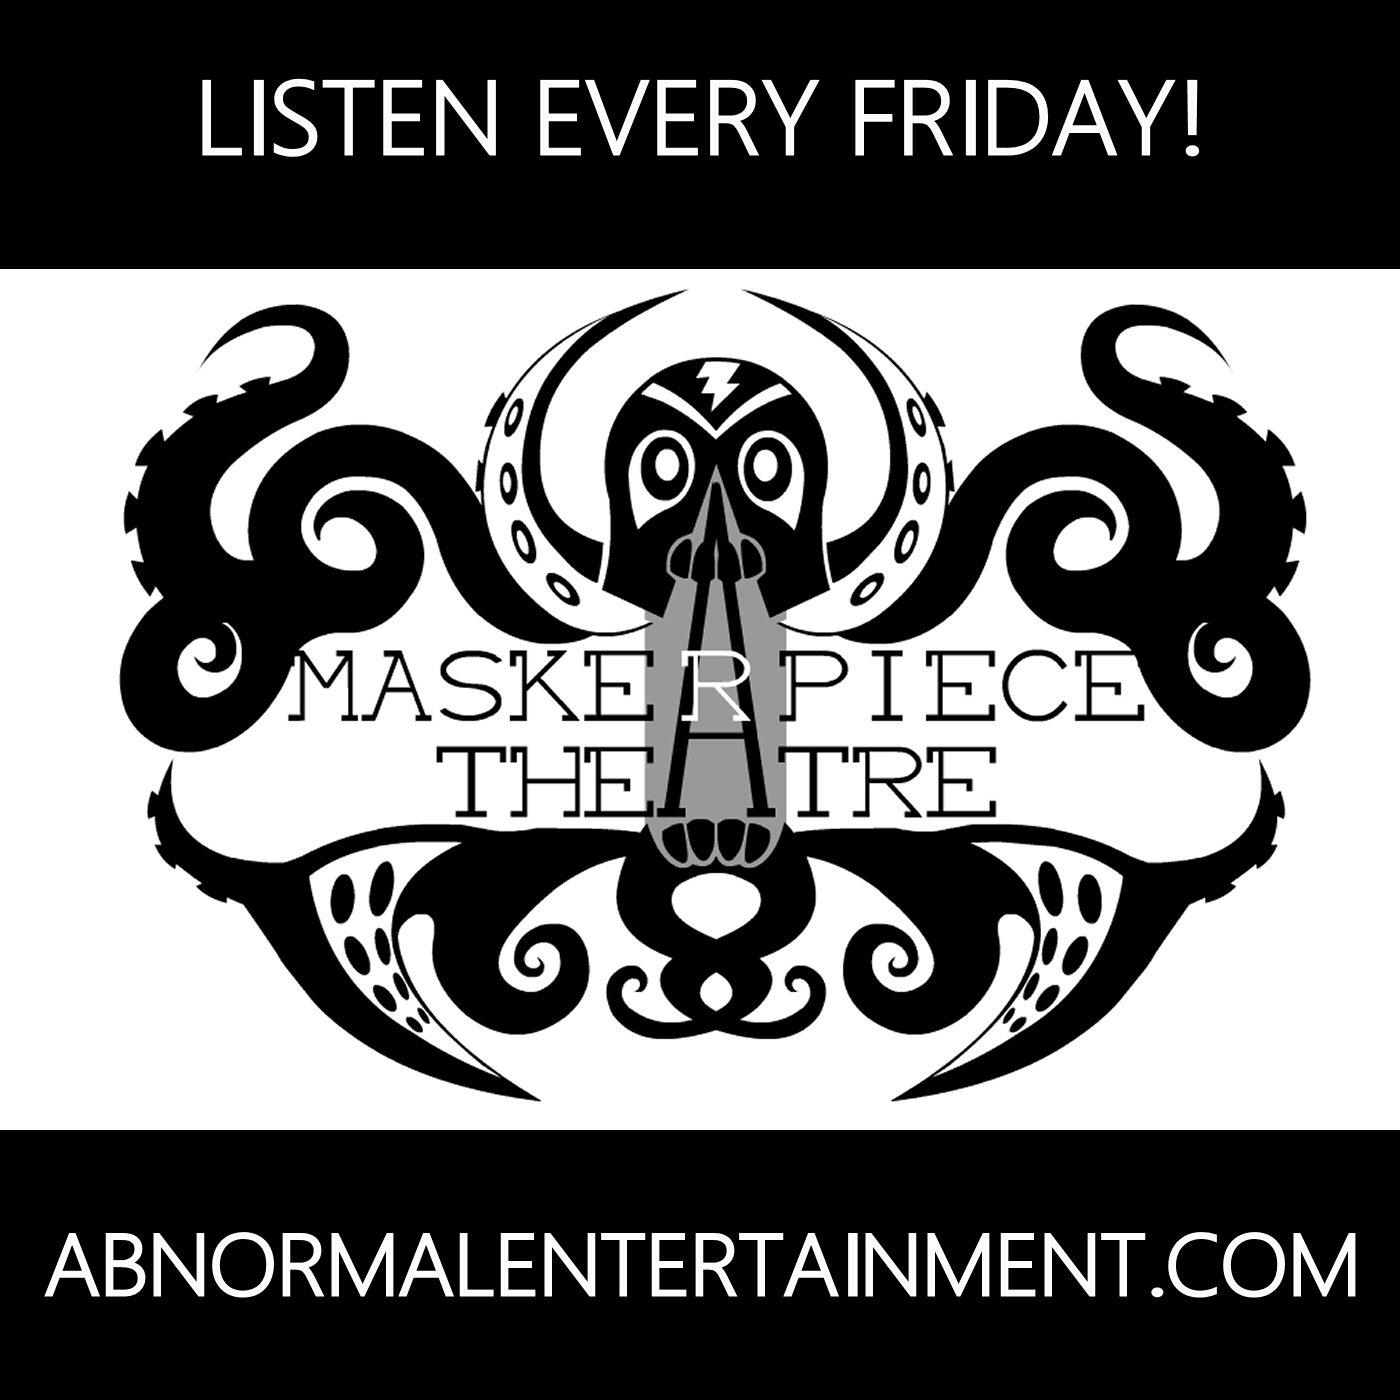 Maskerpiece Theatre   maskerpiecetheatre.blogspot.com